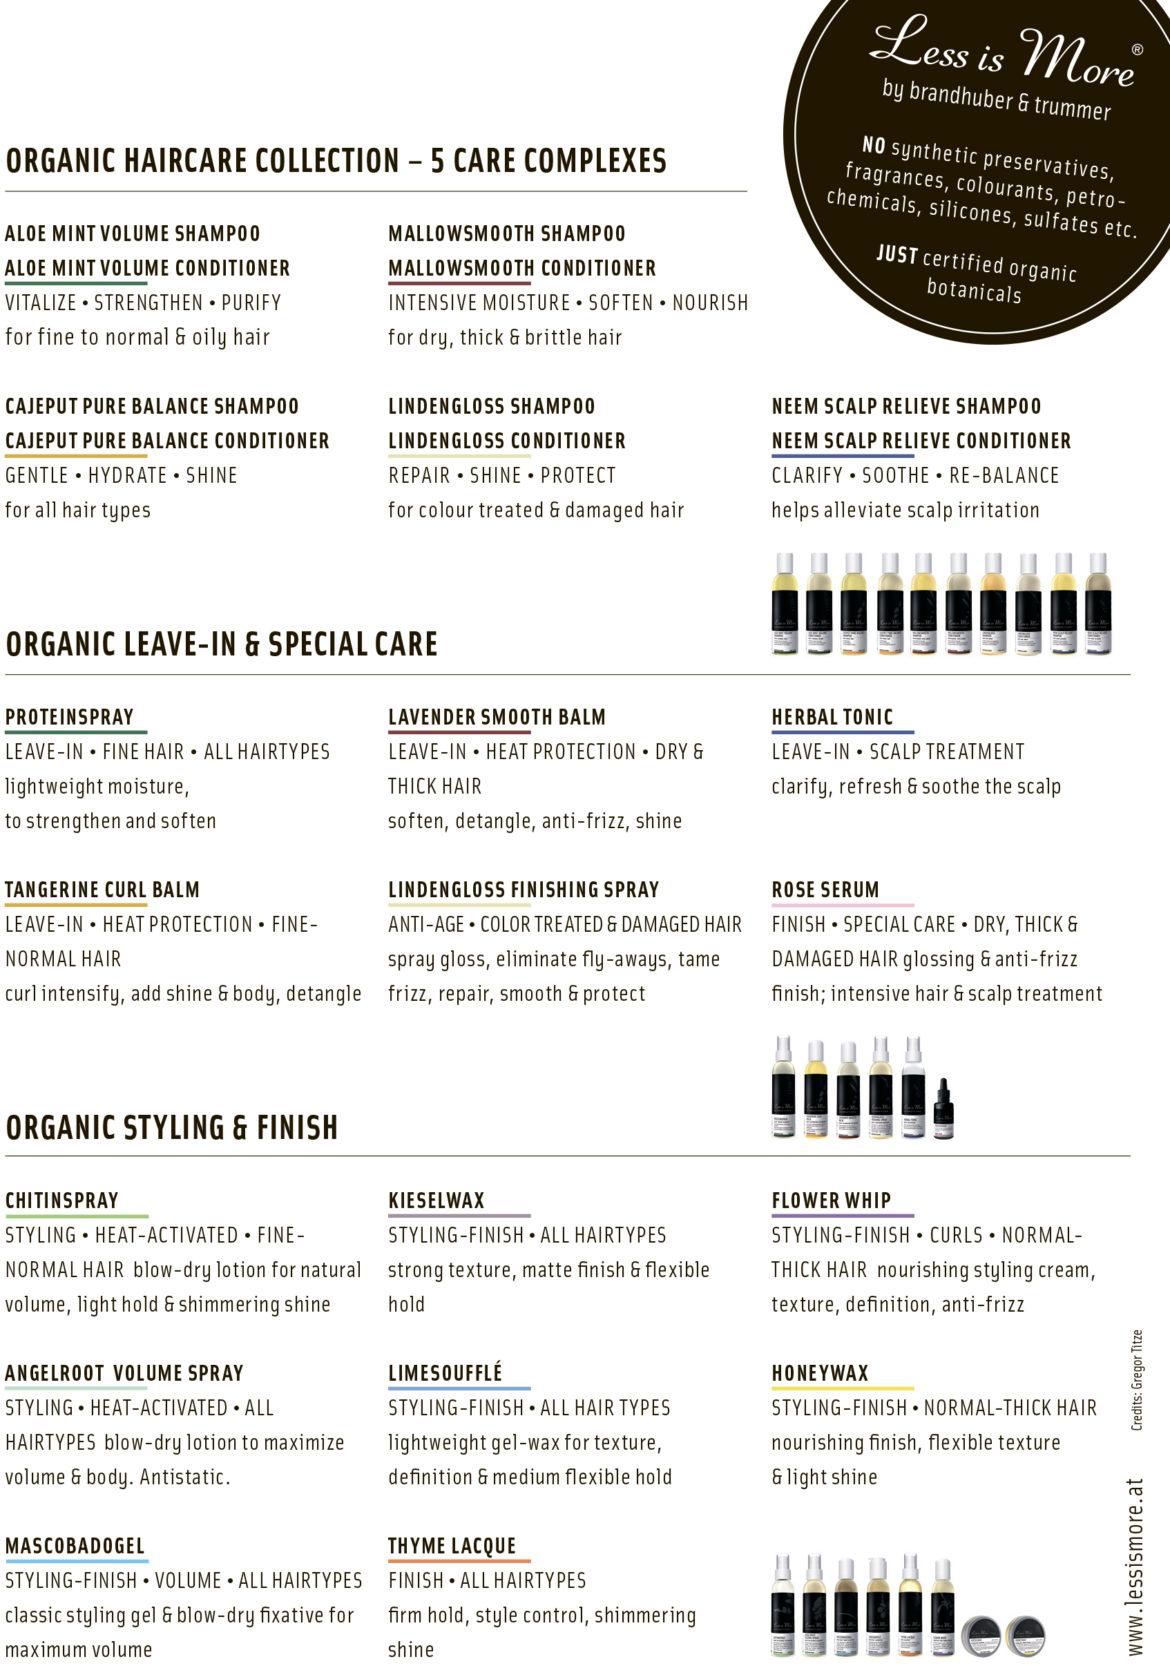 Organic Haircare Guide